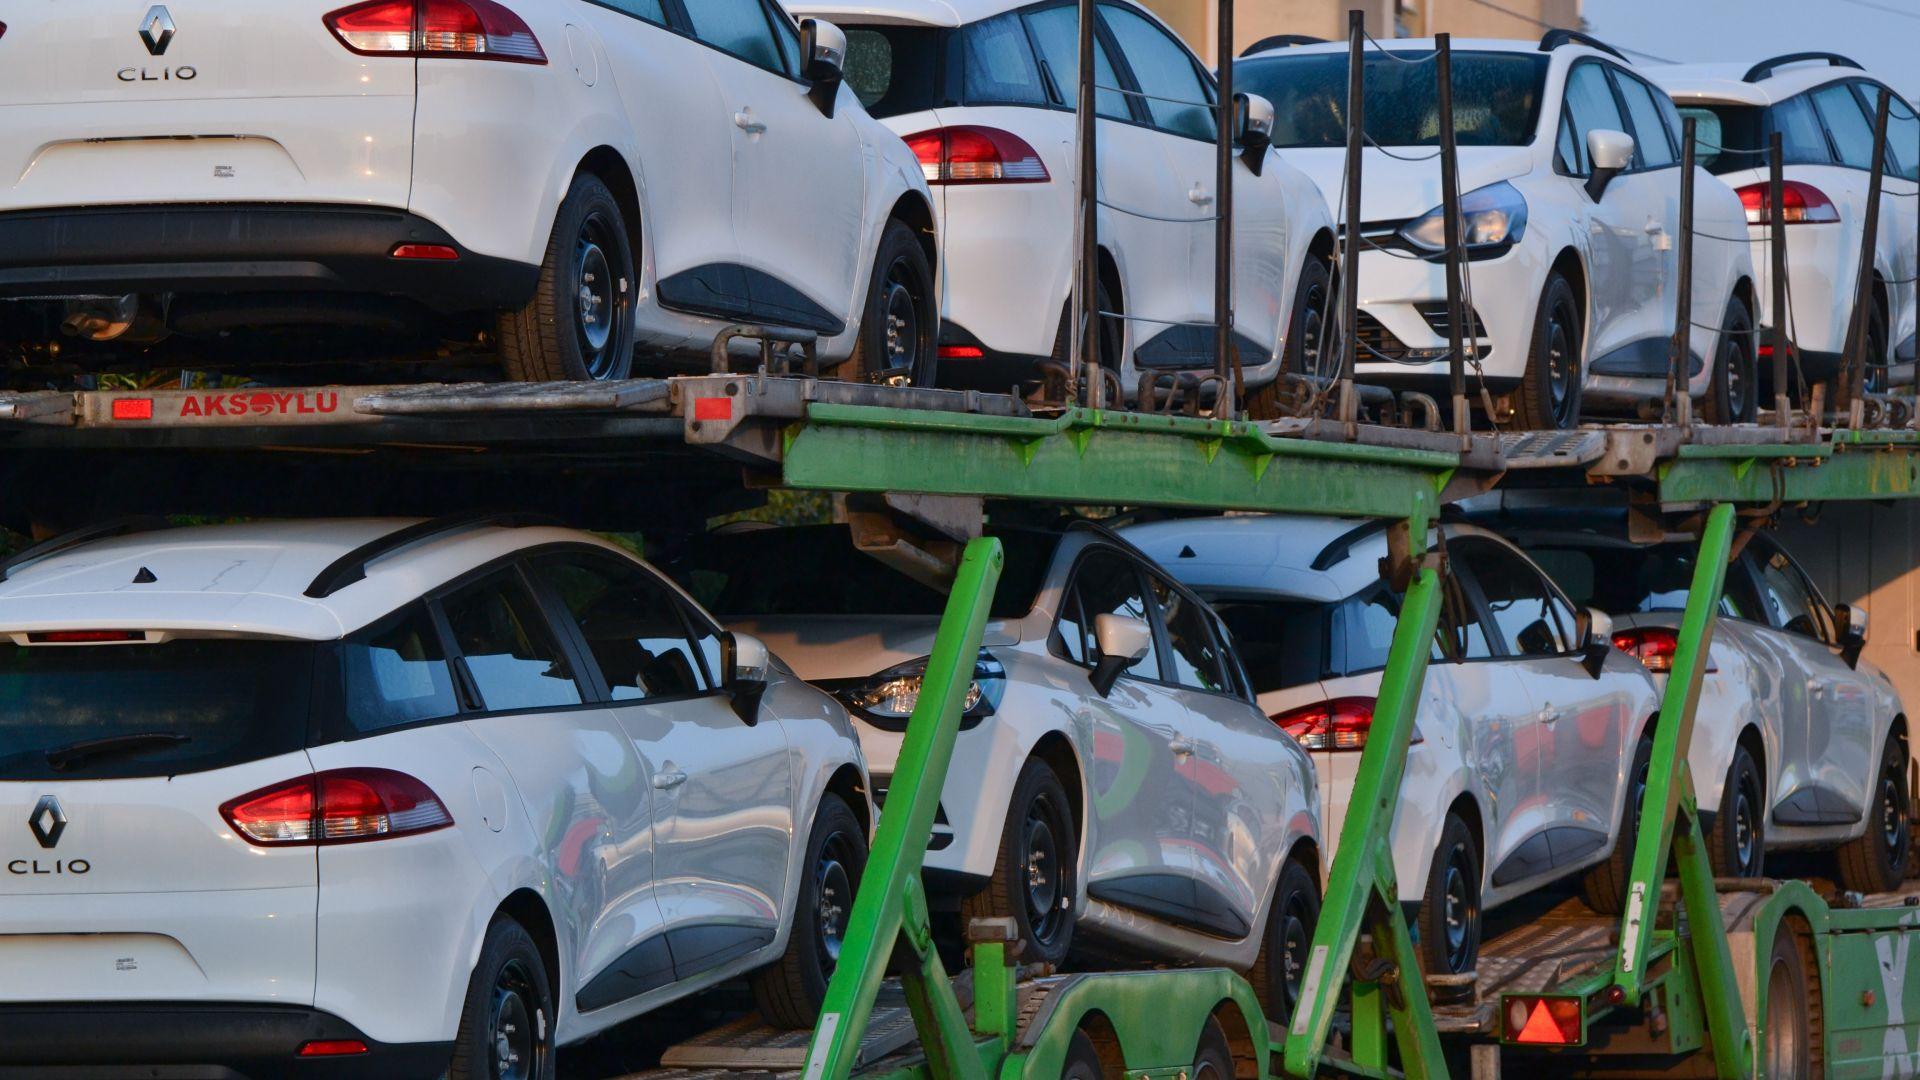 Европейският автомобилен пазар пое нагоре, пореден срив у нас